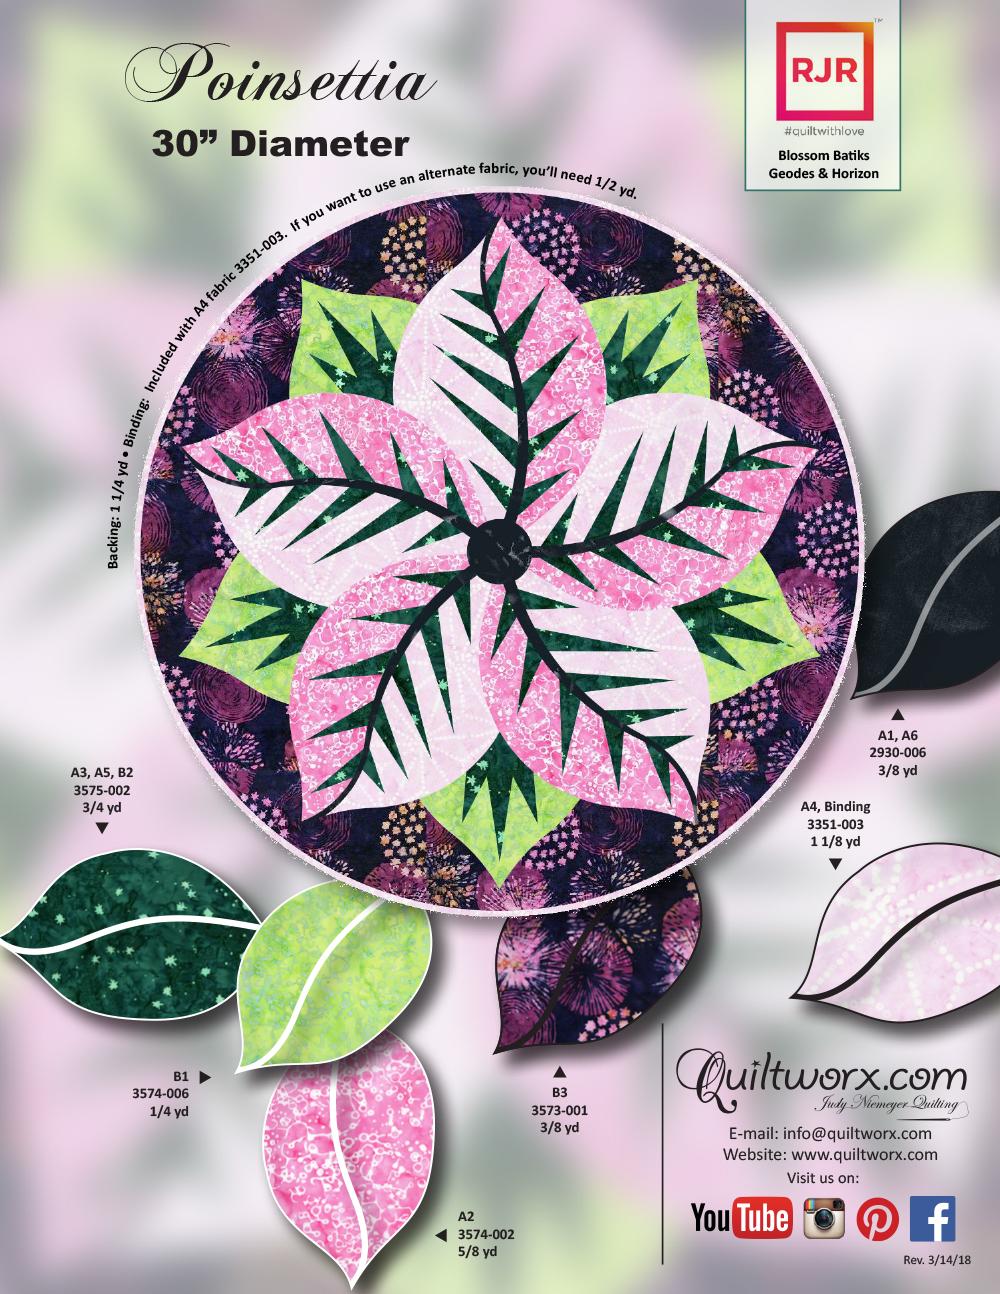 Poinsettia-RJR-Blossom-Batiks-1pg-KS